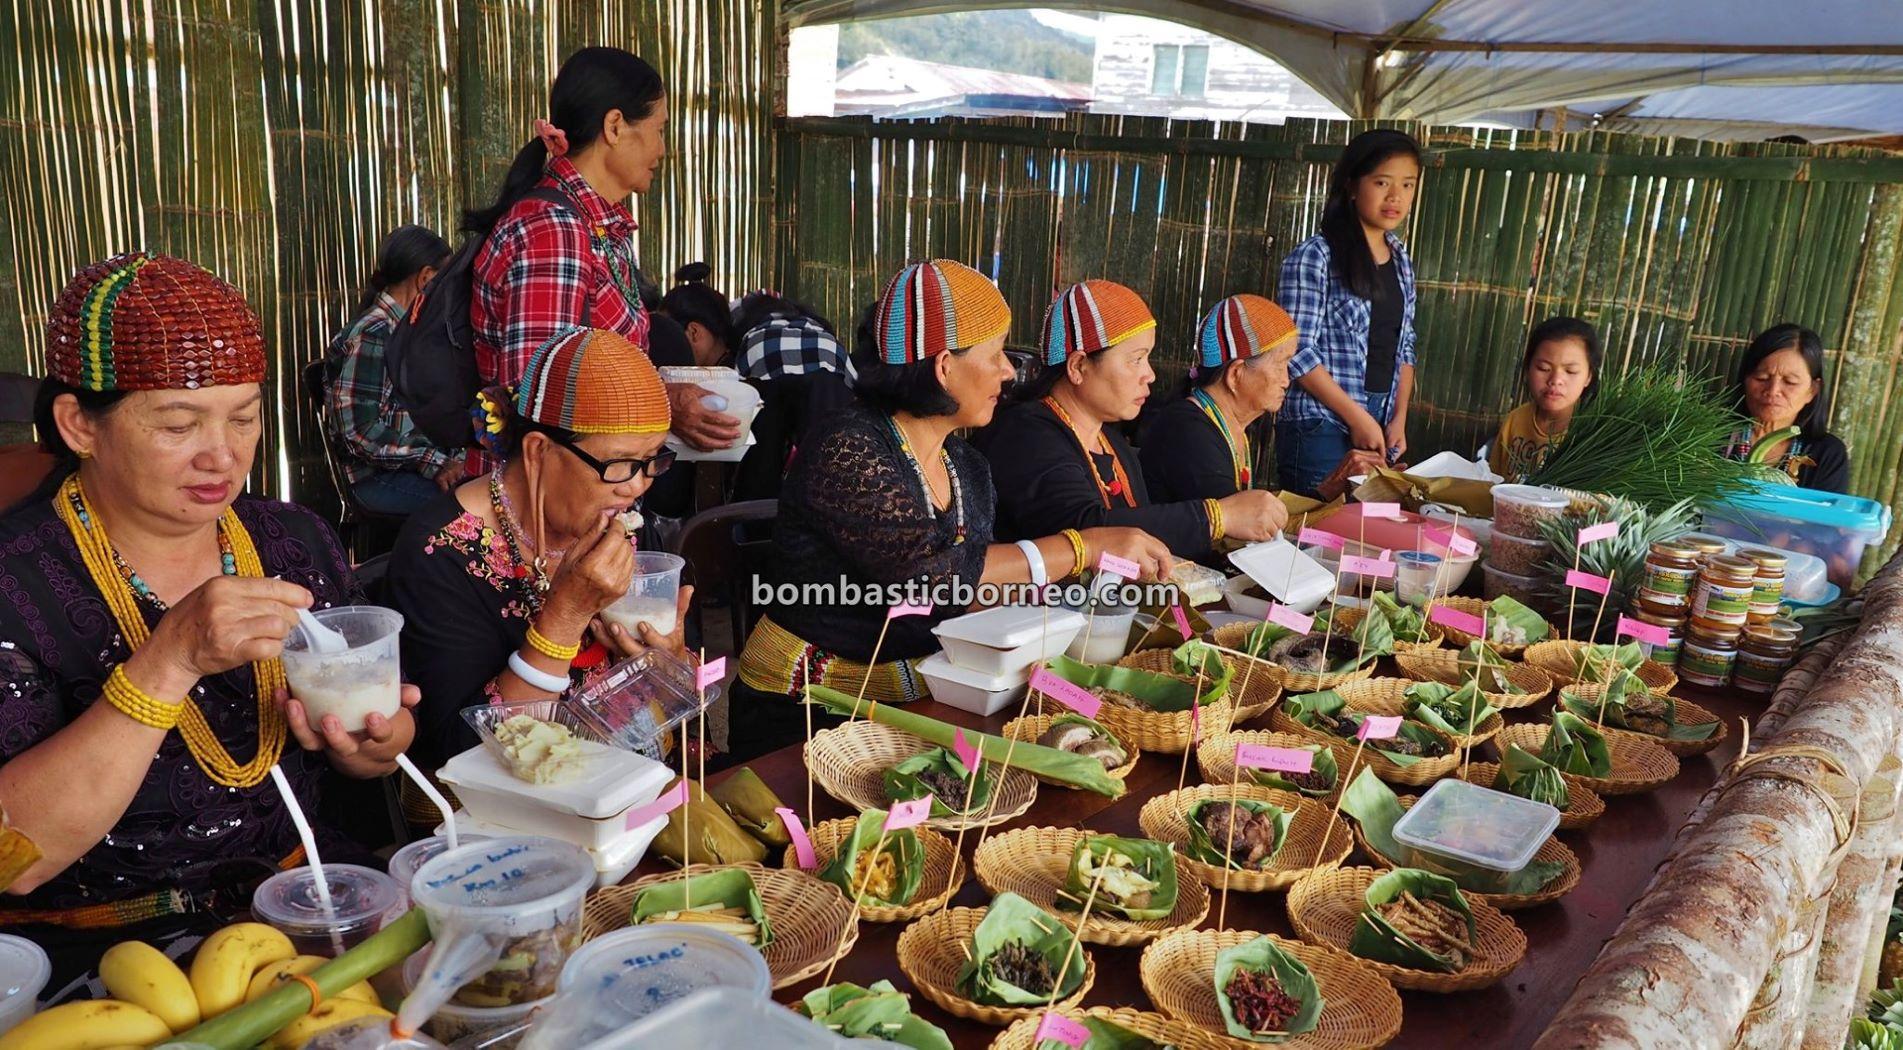 Pesta Nukenen, culture, culinary, indigenous, destination, dayak, orang Ulu, Kelabit people, Malaysia, Tourism, travel guide, Borneo, 探索婆罗洲游踪, 砂拉越巴里奥美食, 加拉毕族传统文化,